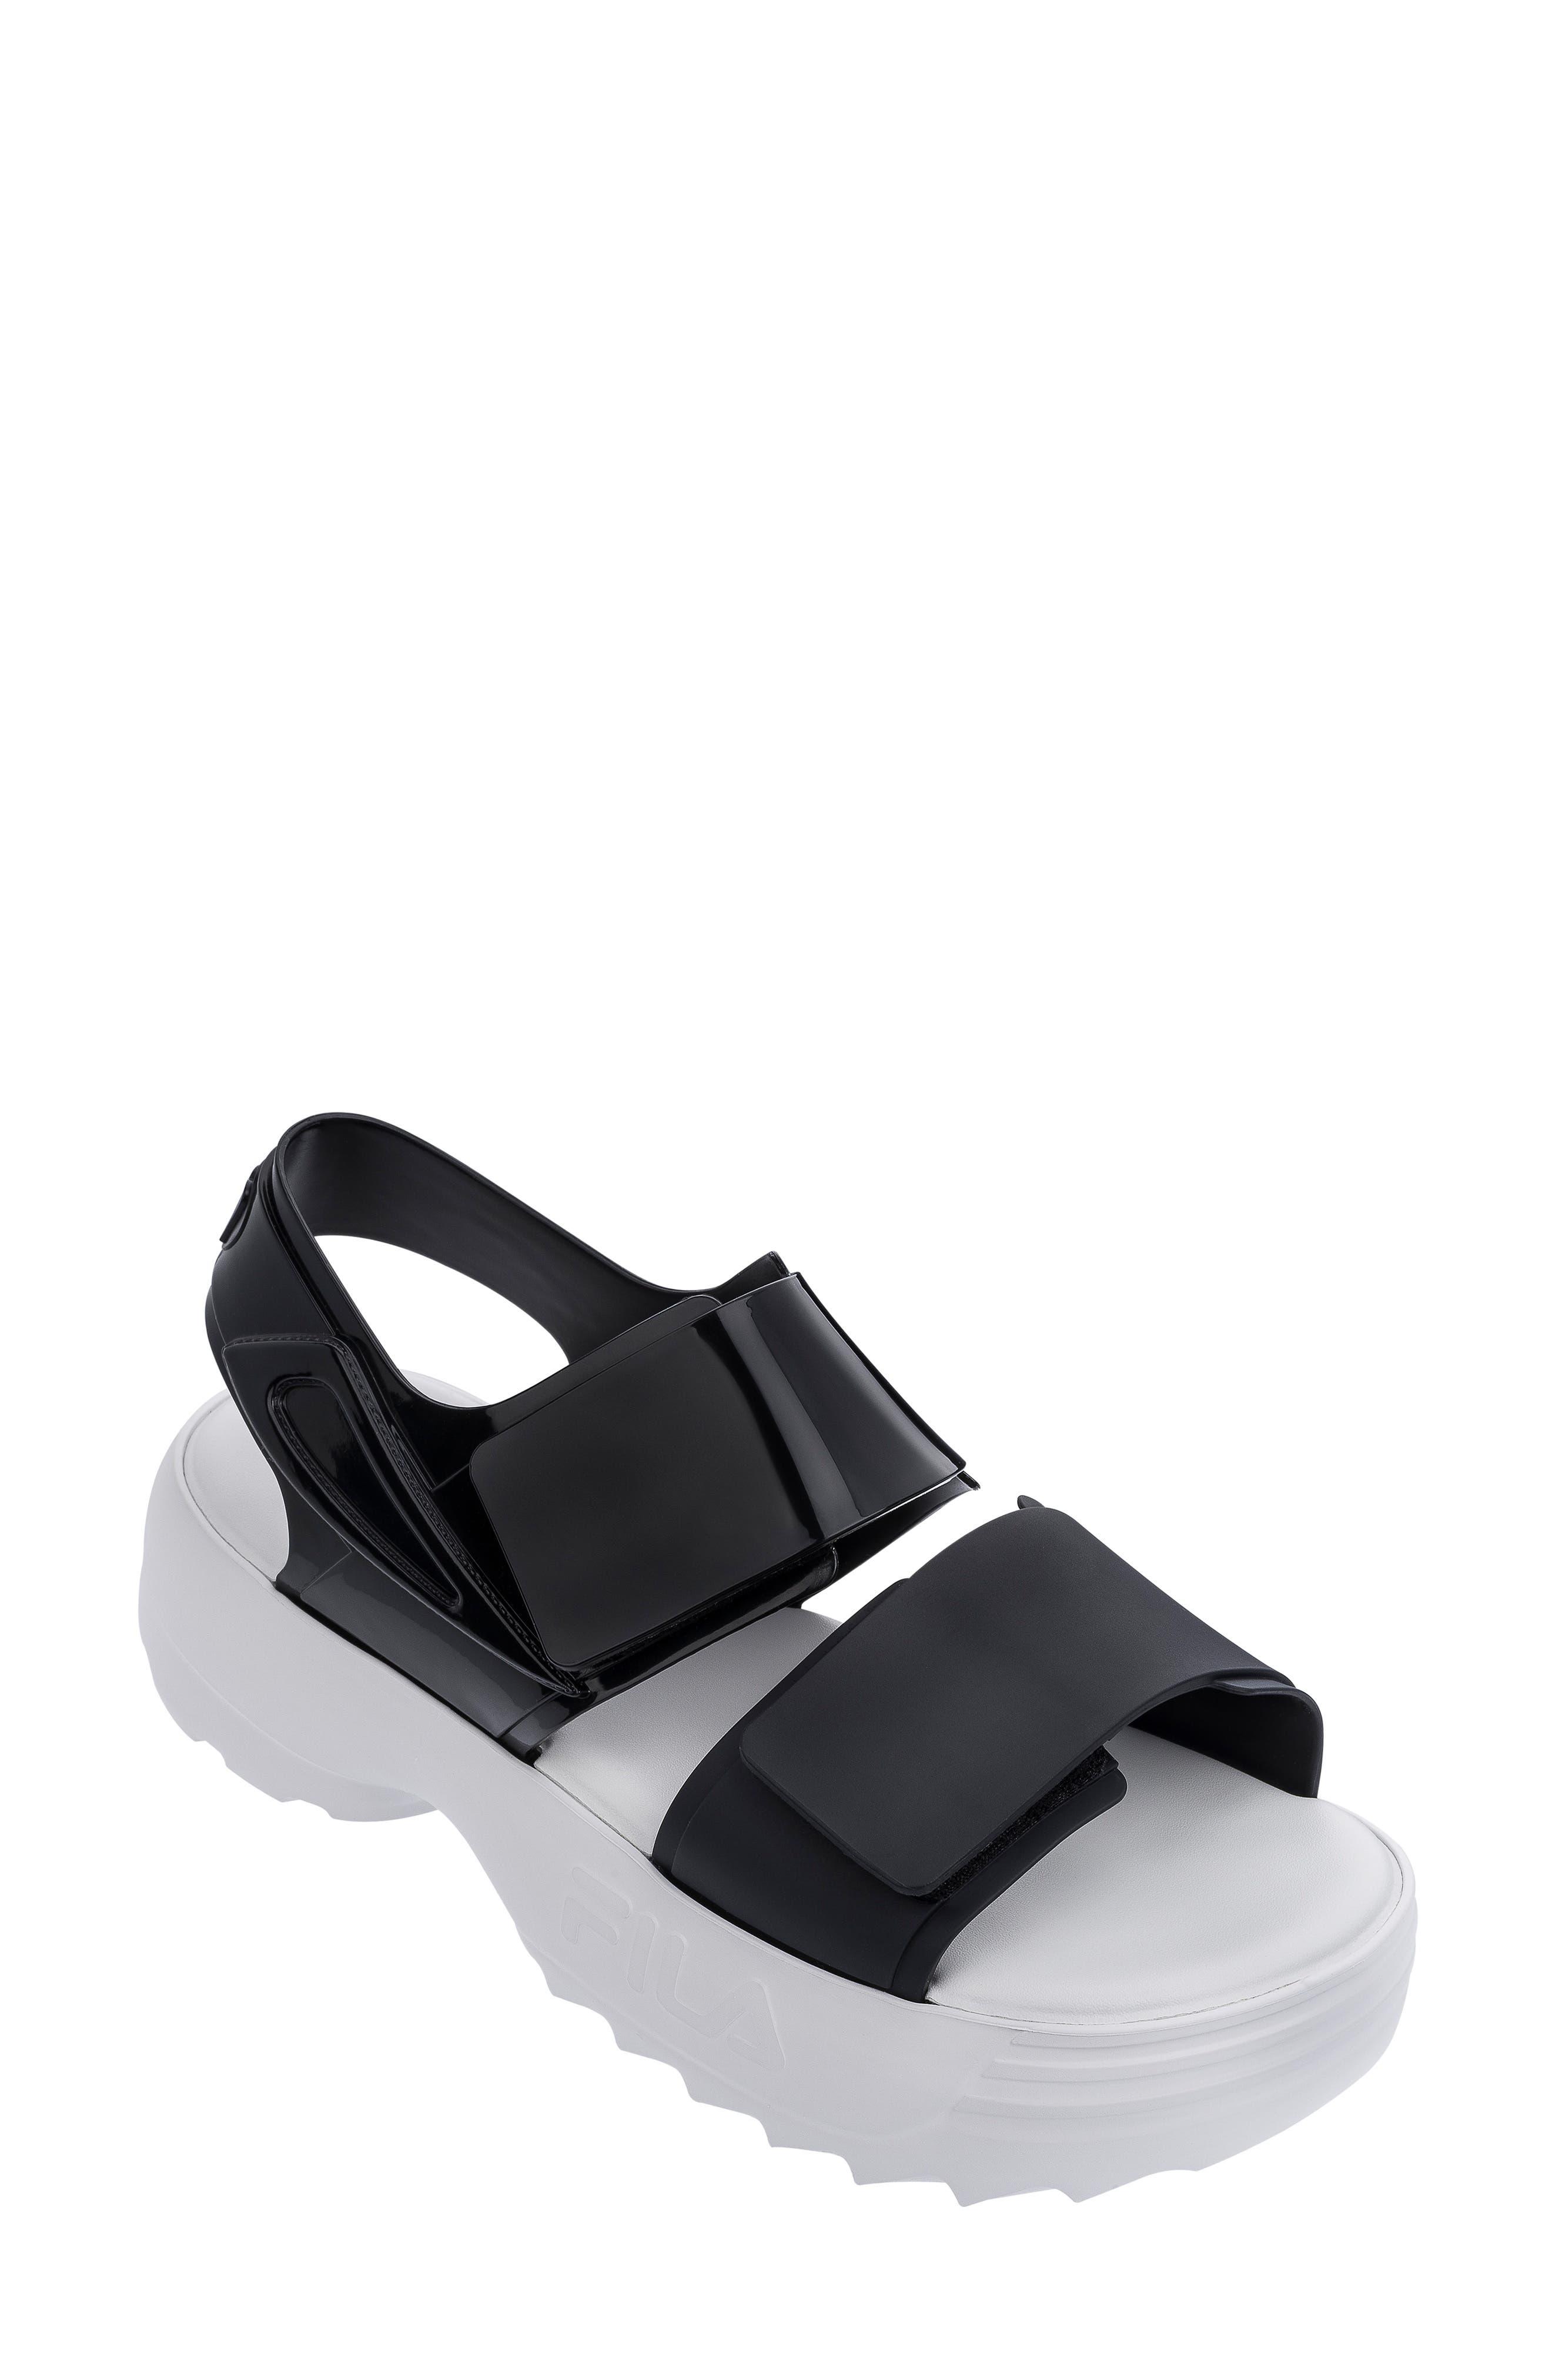 fila platform sandals